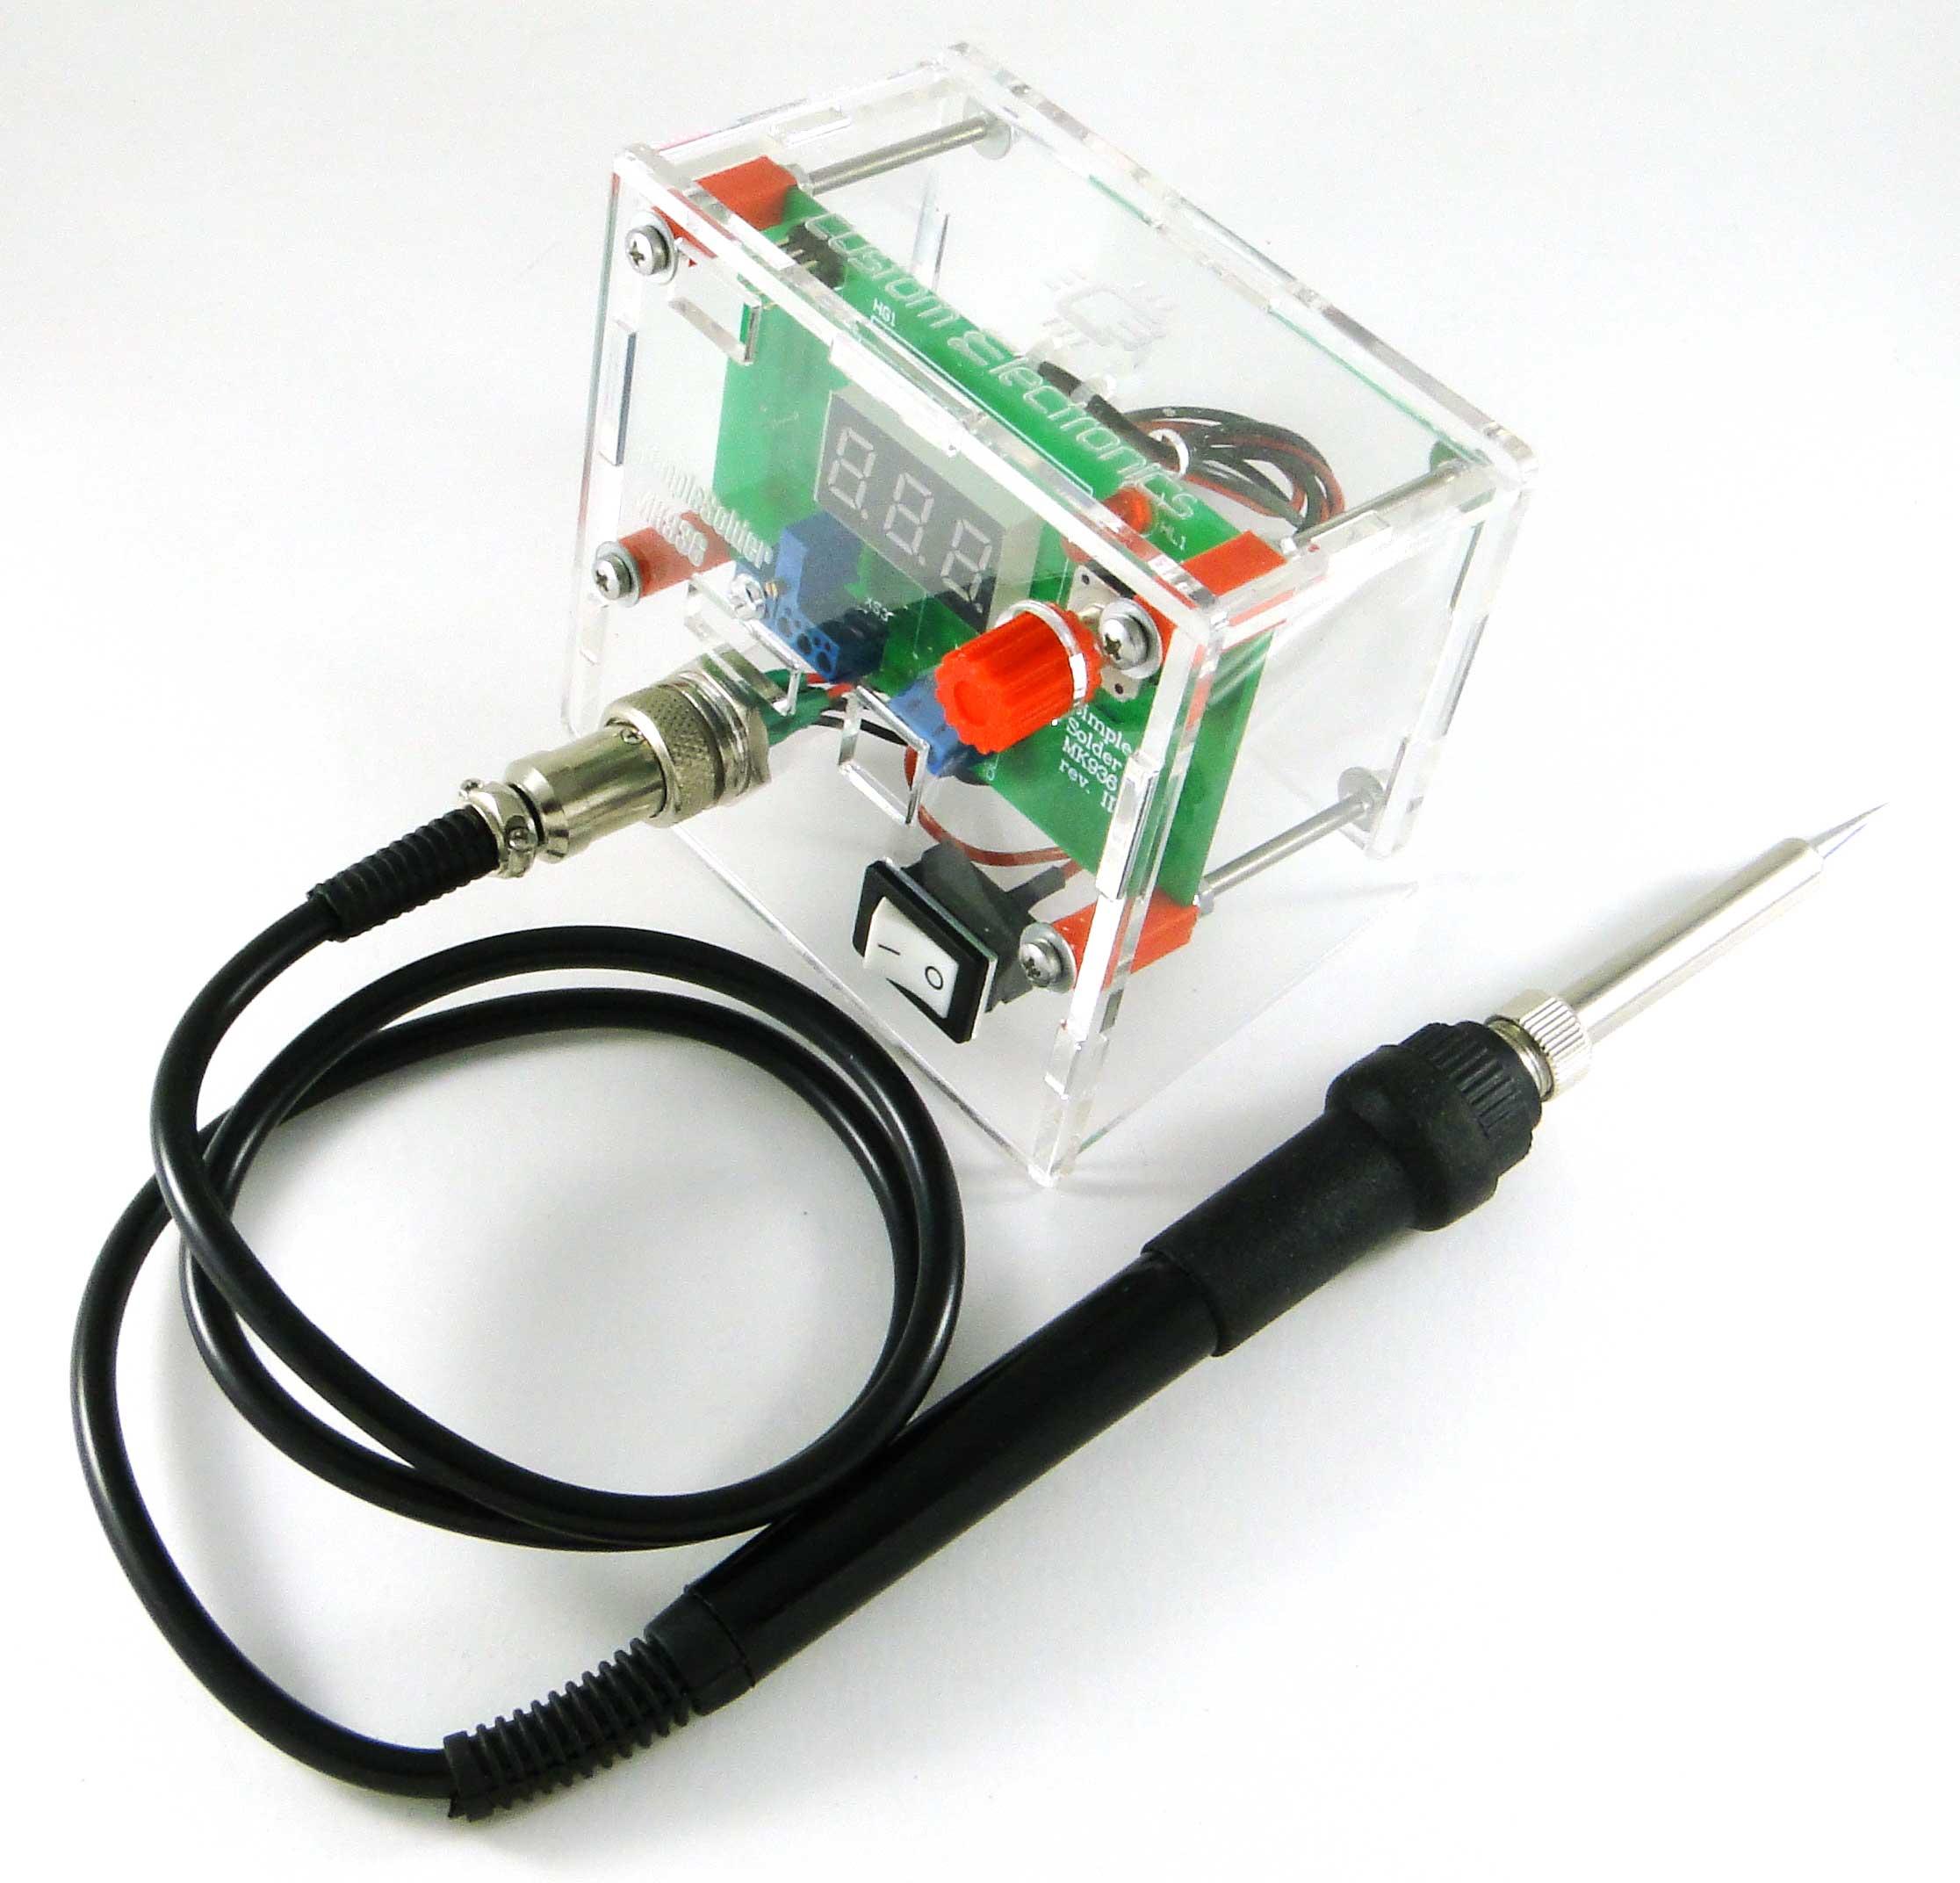 Simple Solder MK936 SMD. Паяльная станция на SMD-компонентах своими руками - 1